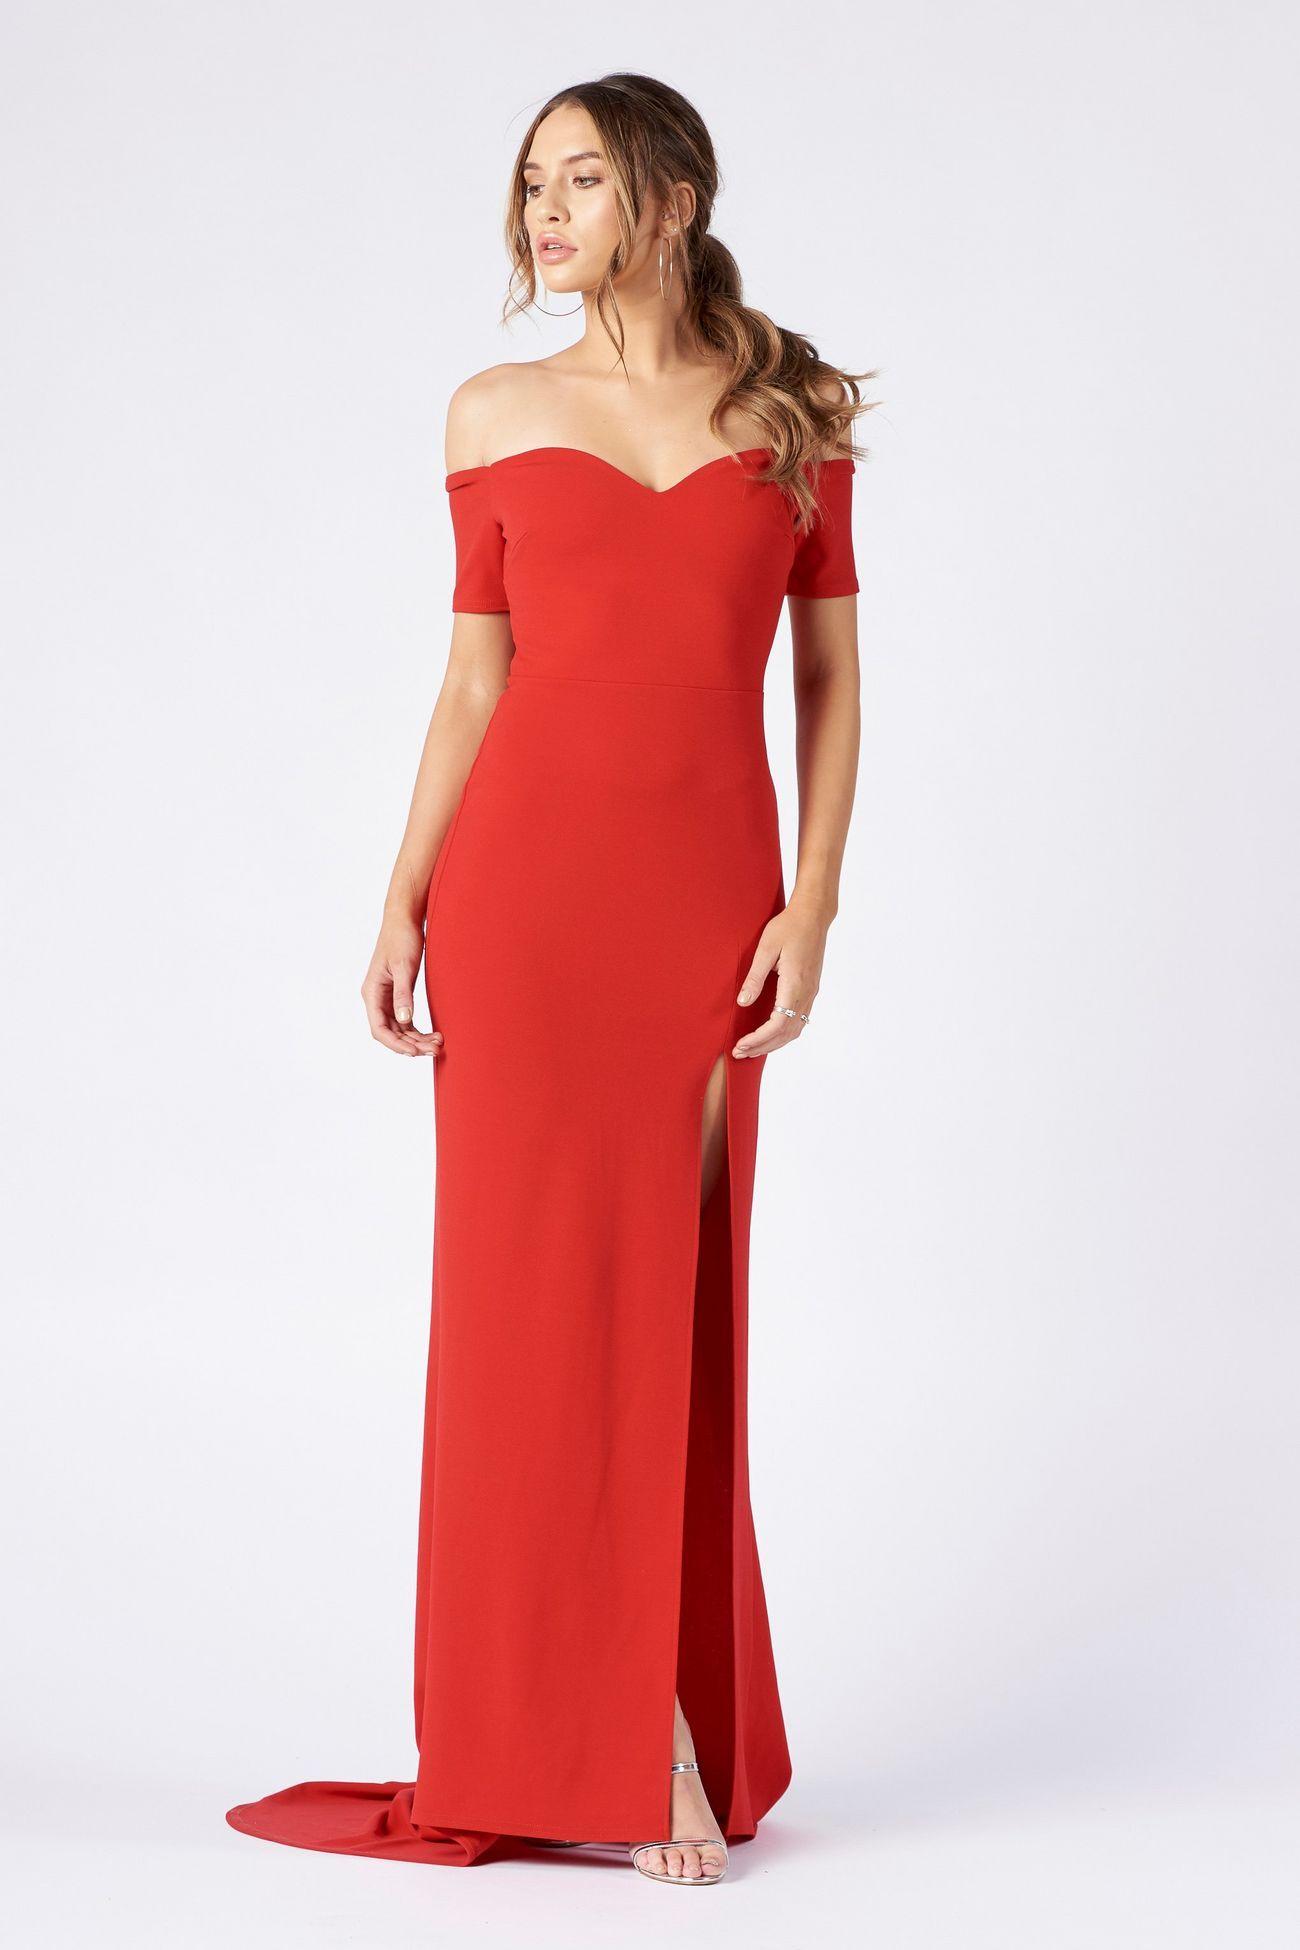 Bardot Thigh Split Maxi Dress By Club L Maxi Dress With Sleeves Bond Girl Dresses Midi Dress With Sleeves